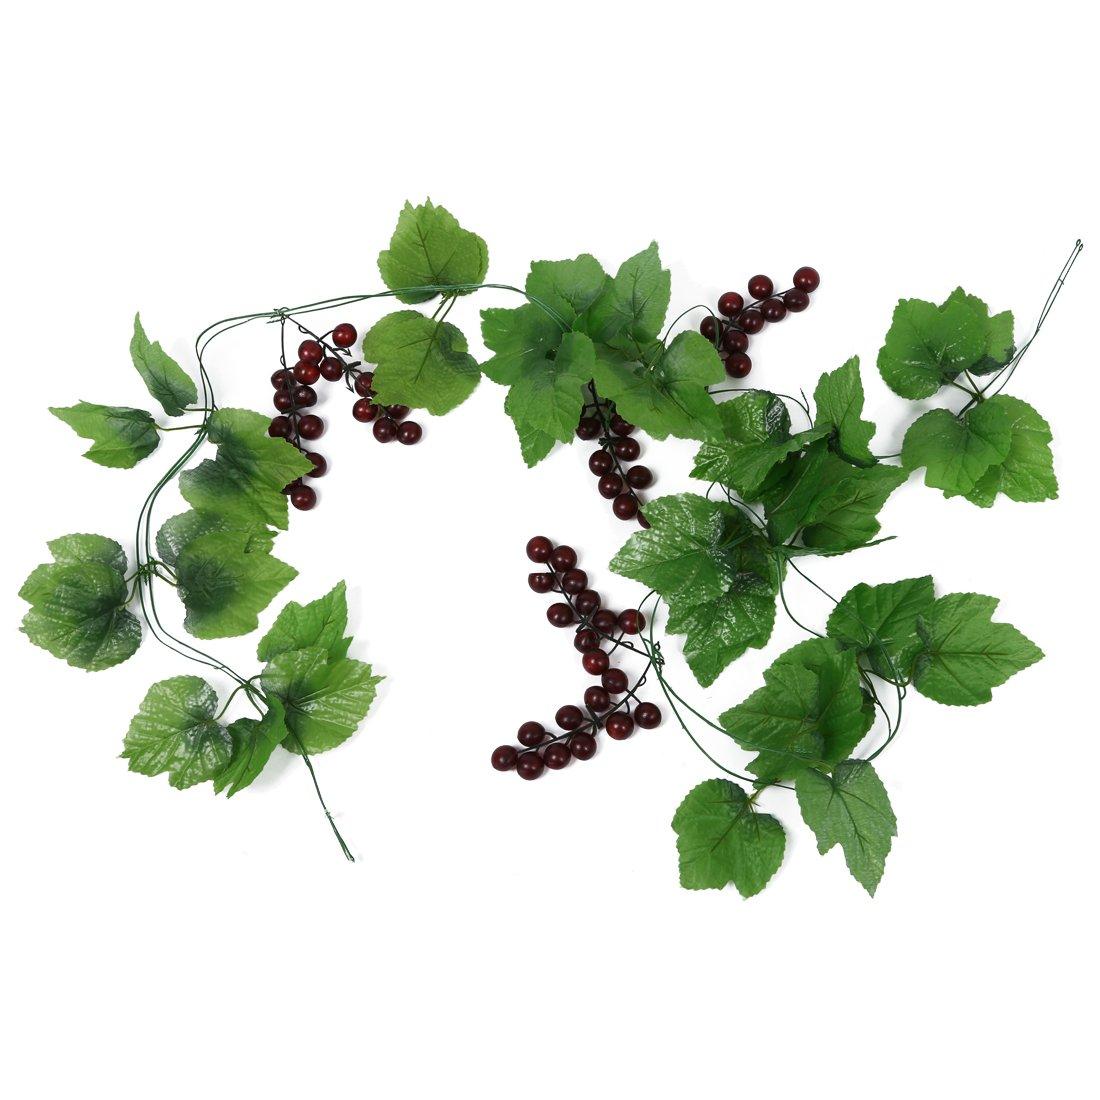 Gaoominy 2x Artificial Grape Vine Garland Fruit for Home Garden Decoration